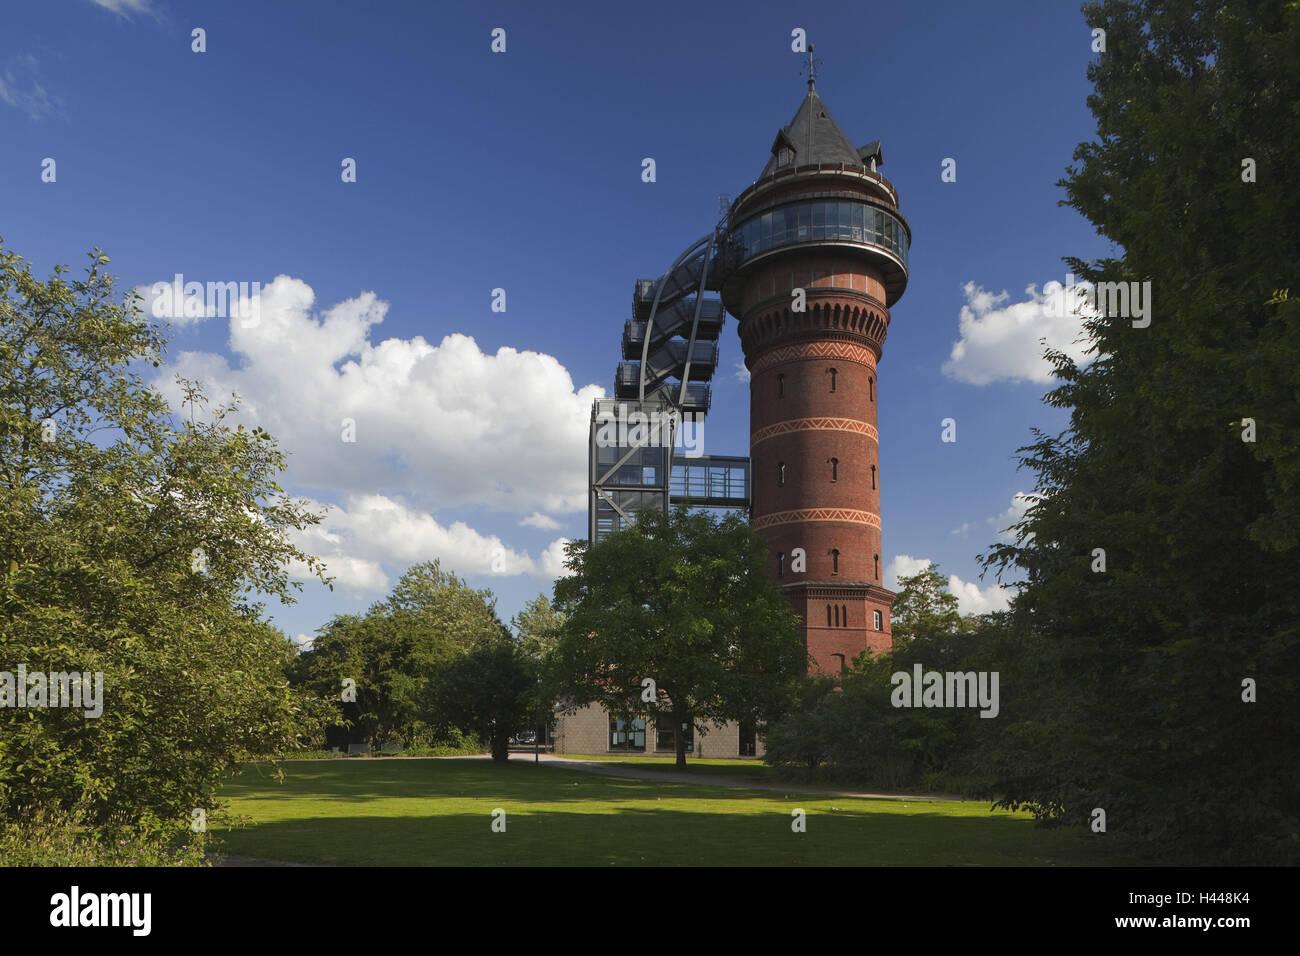 Germany, North Rhine-Westphalia, Mülheim at the Ruhr (region), Aquarius water museum, - Stock Image